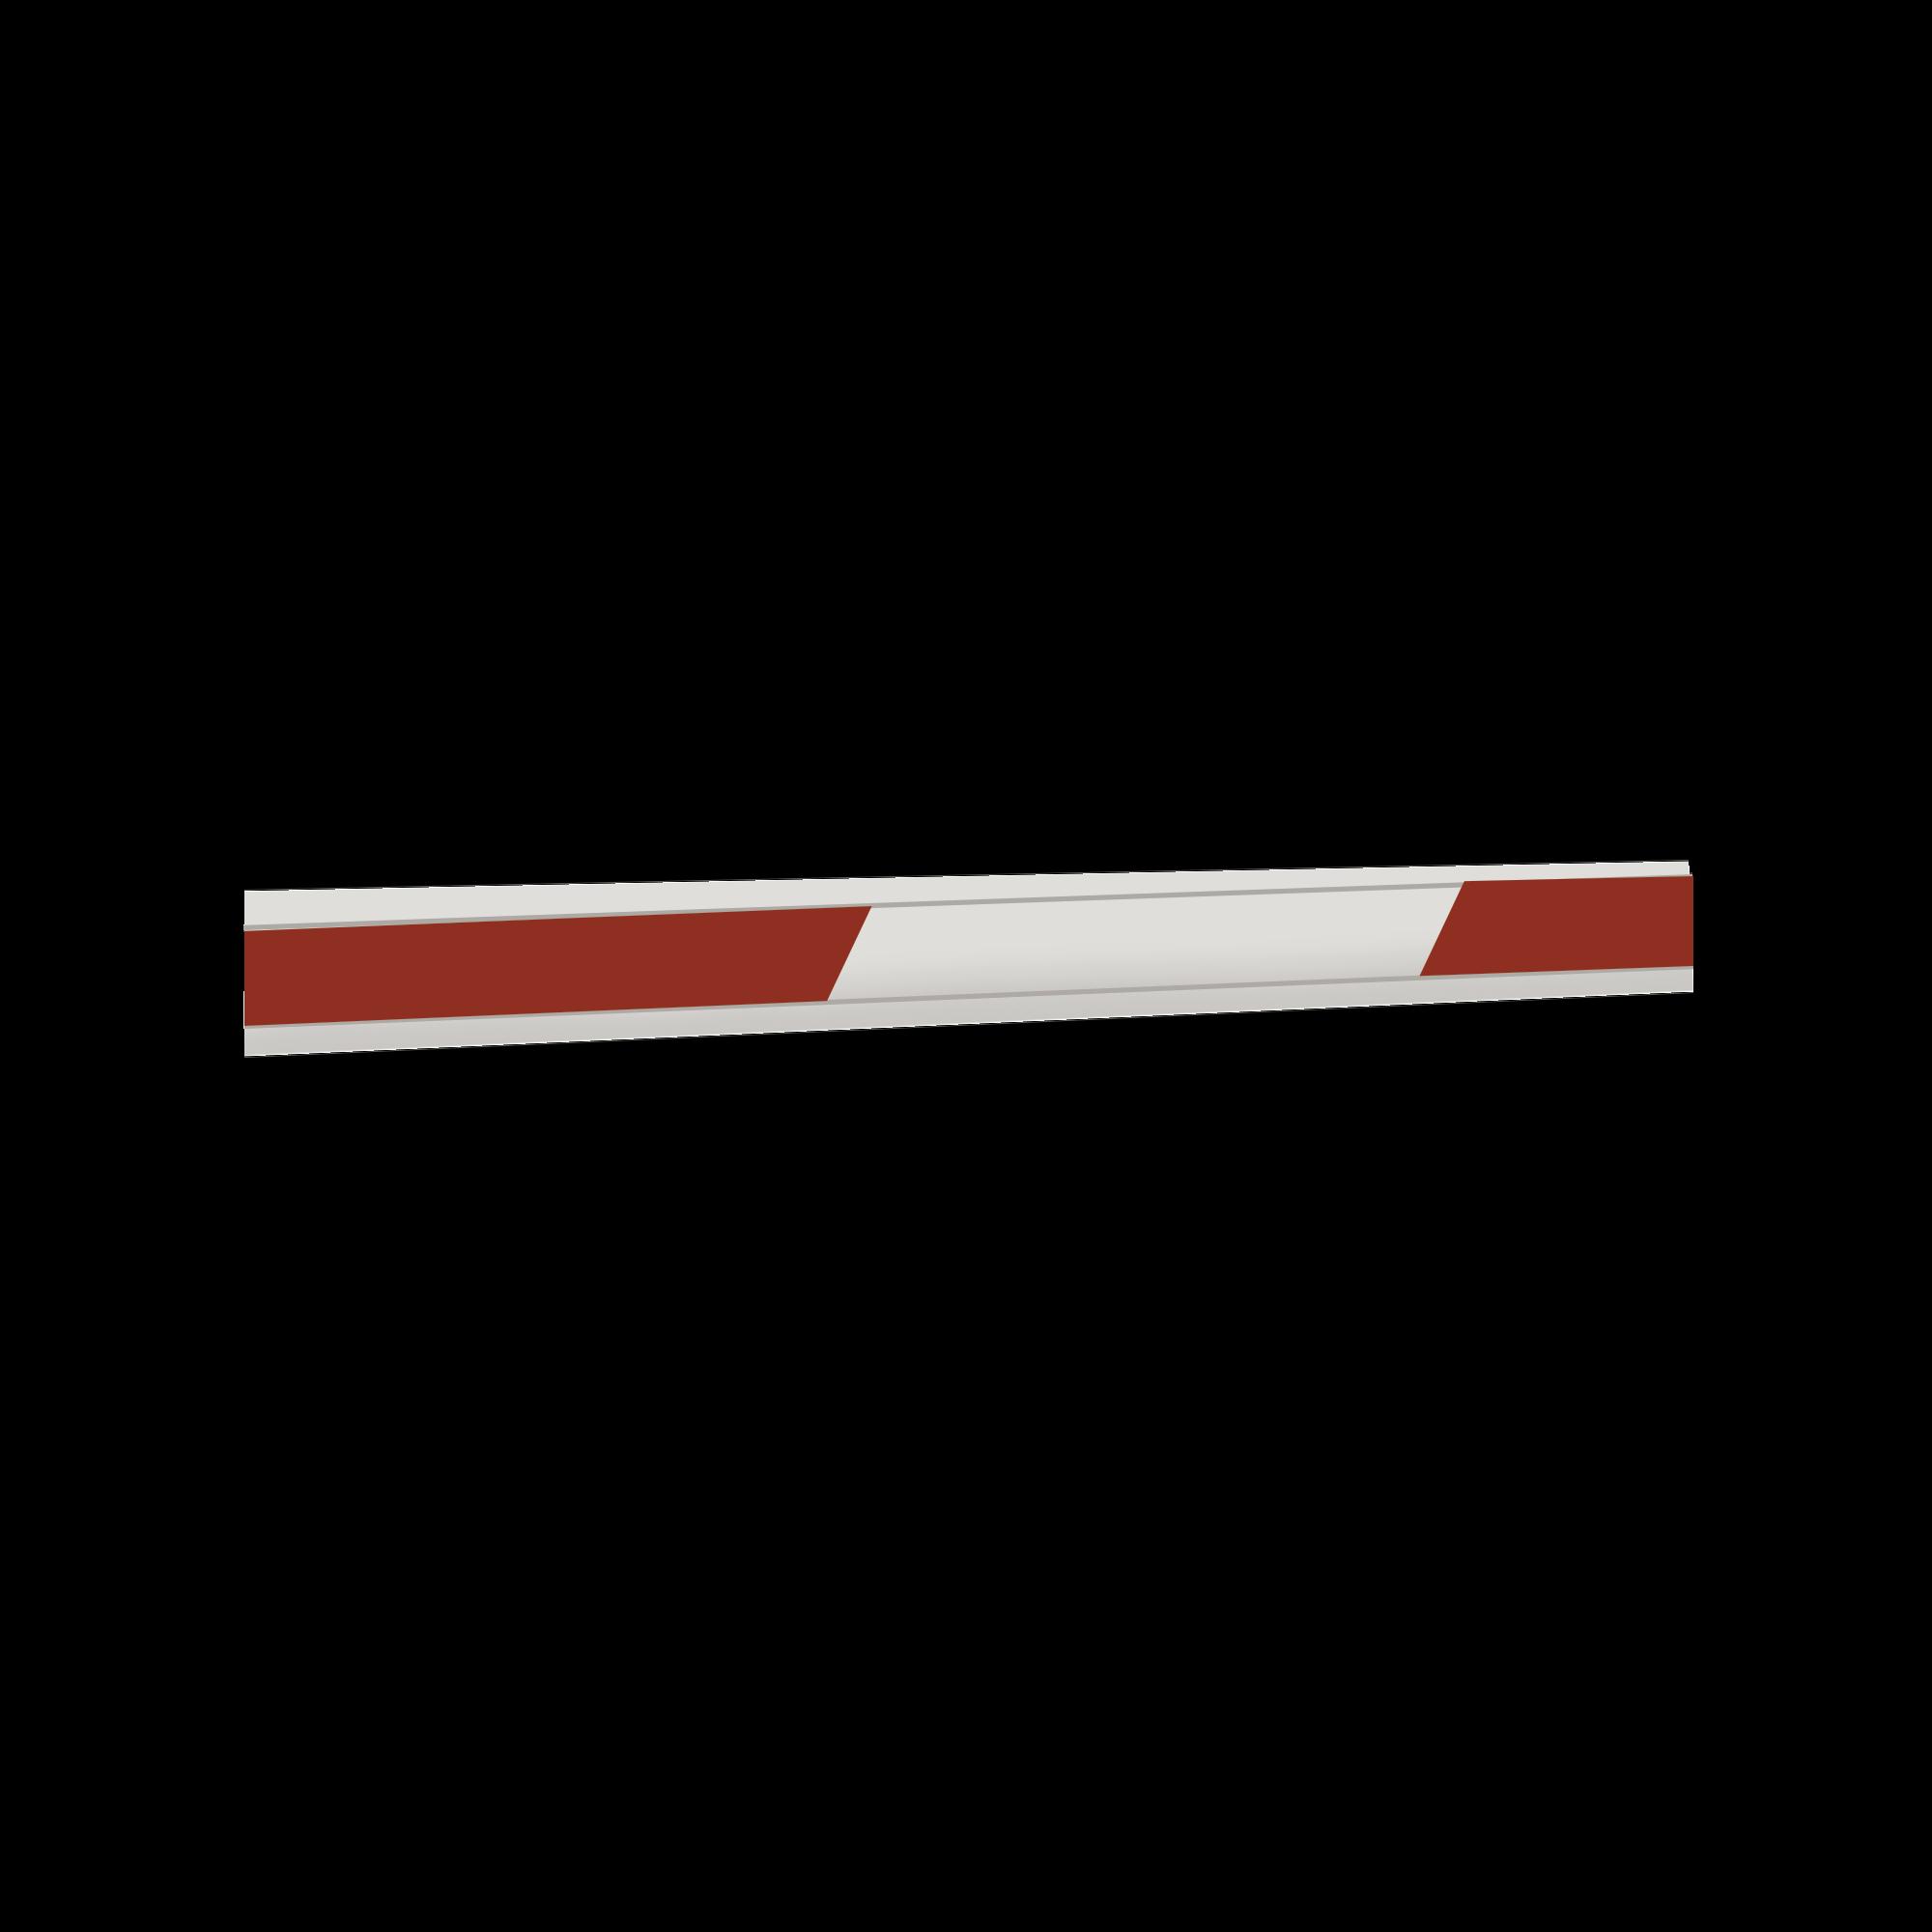 Mastil de 7 metros compatible con FAAC640